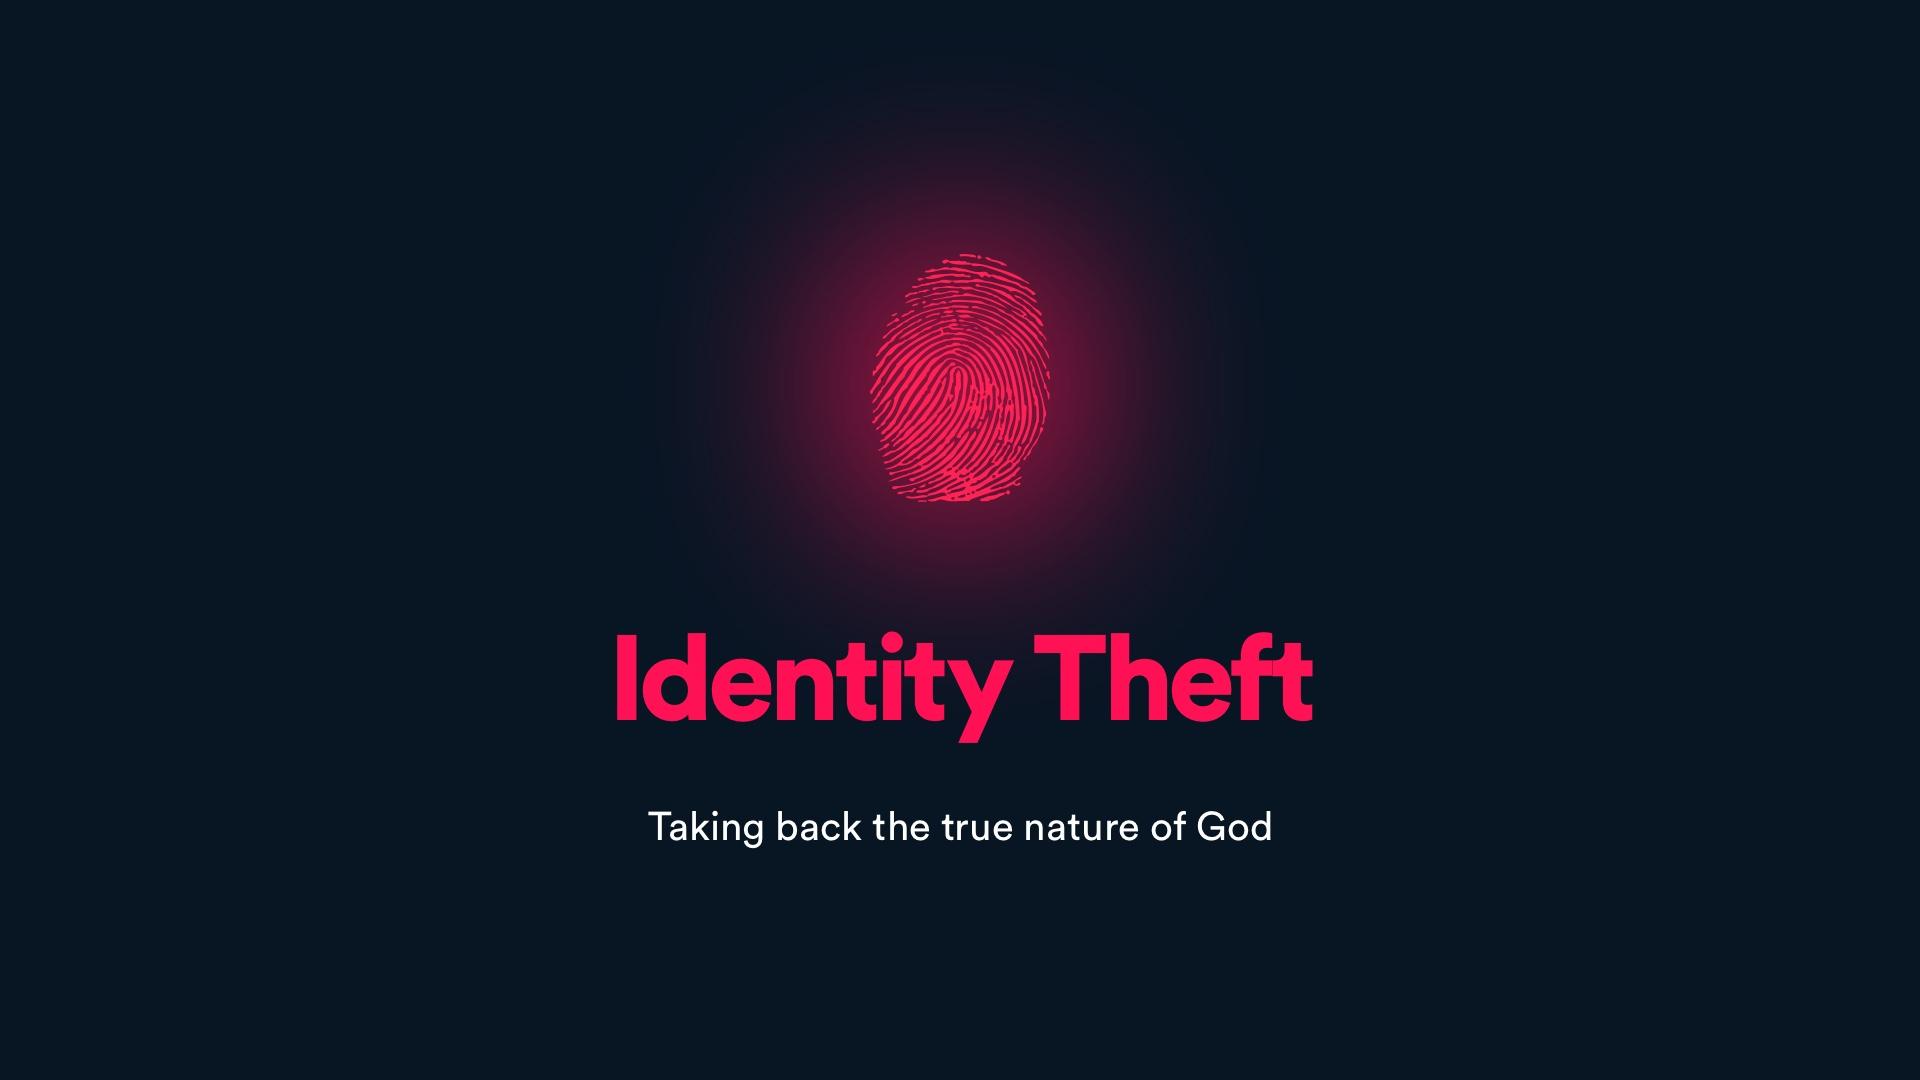 IdentityTheft-HD.jpg